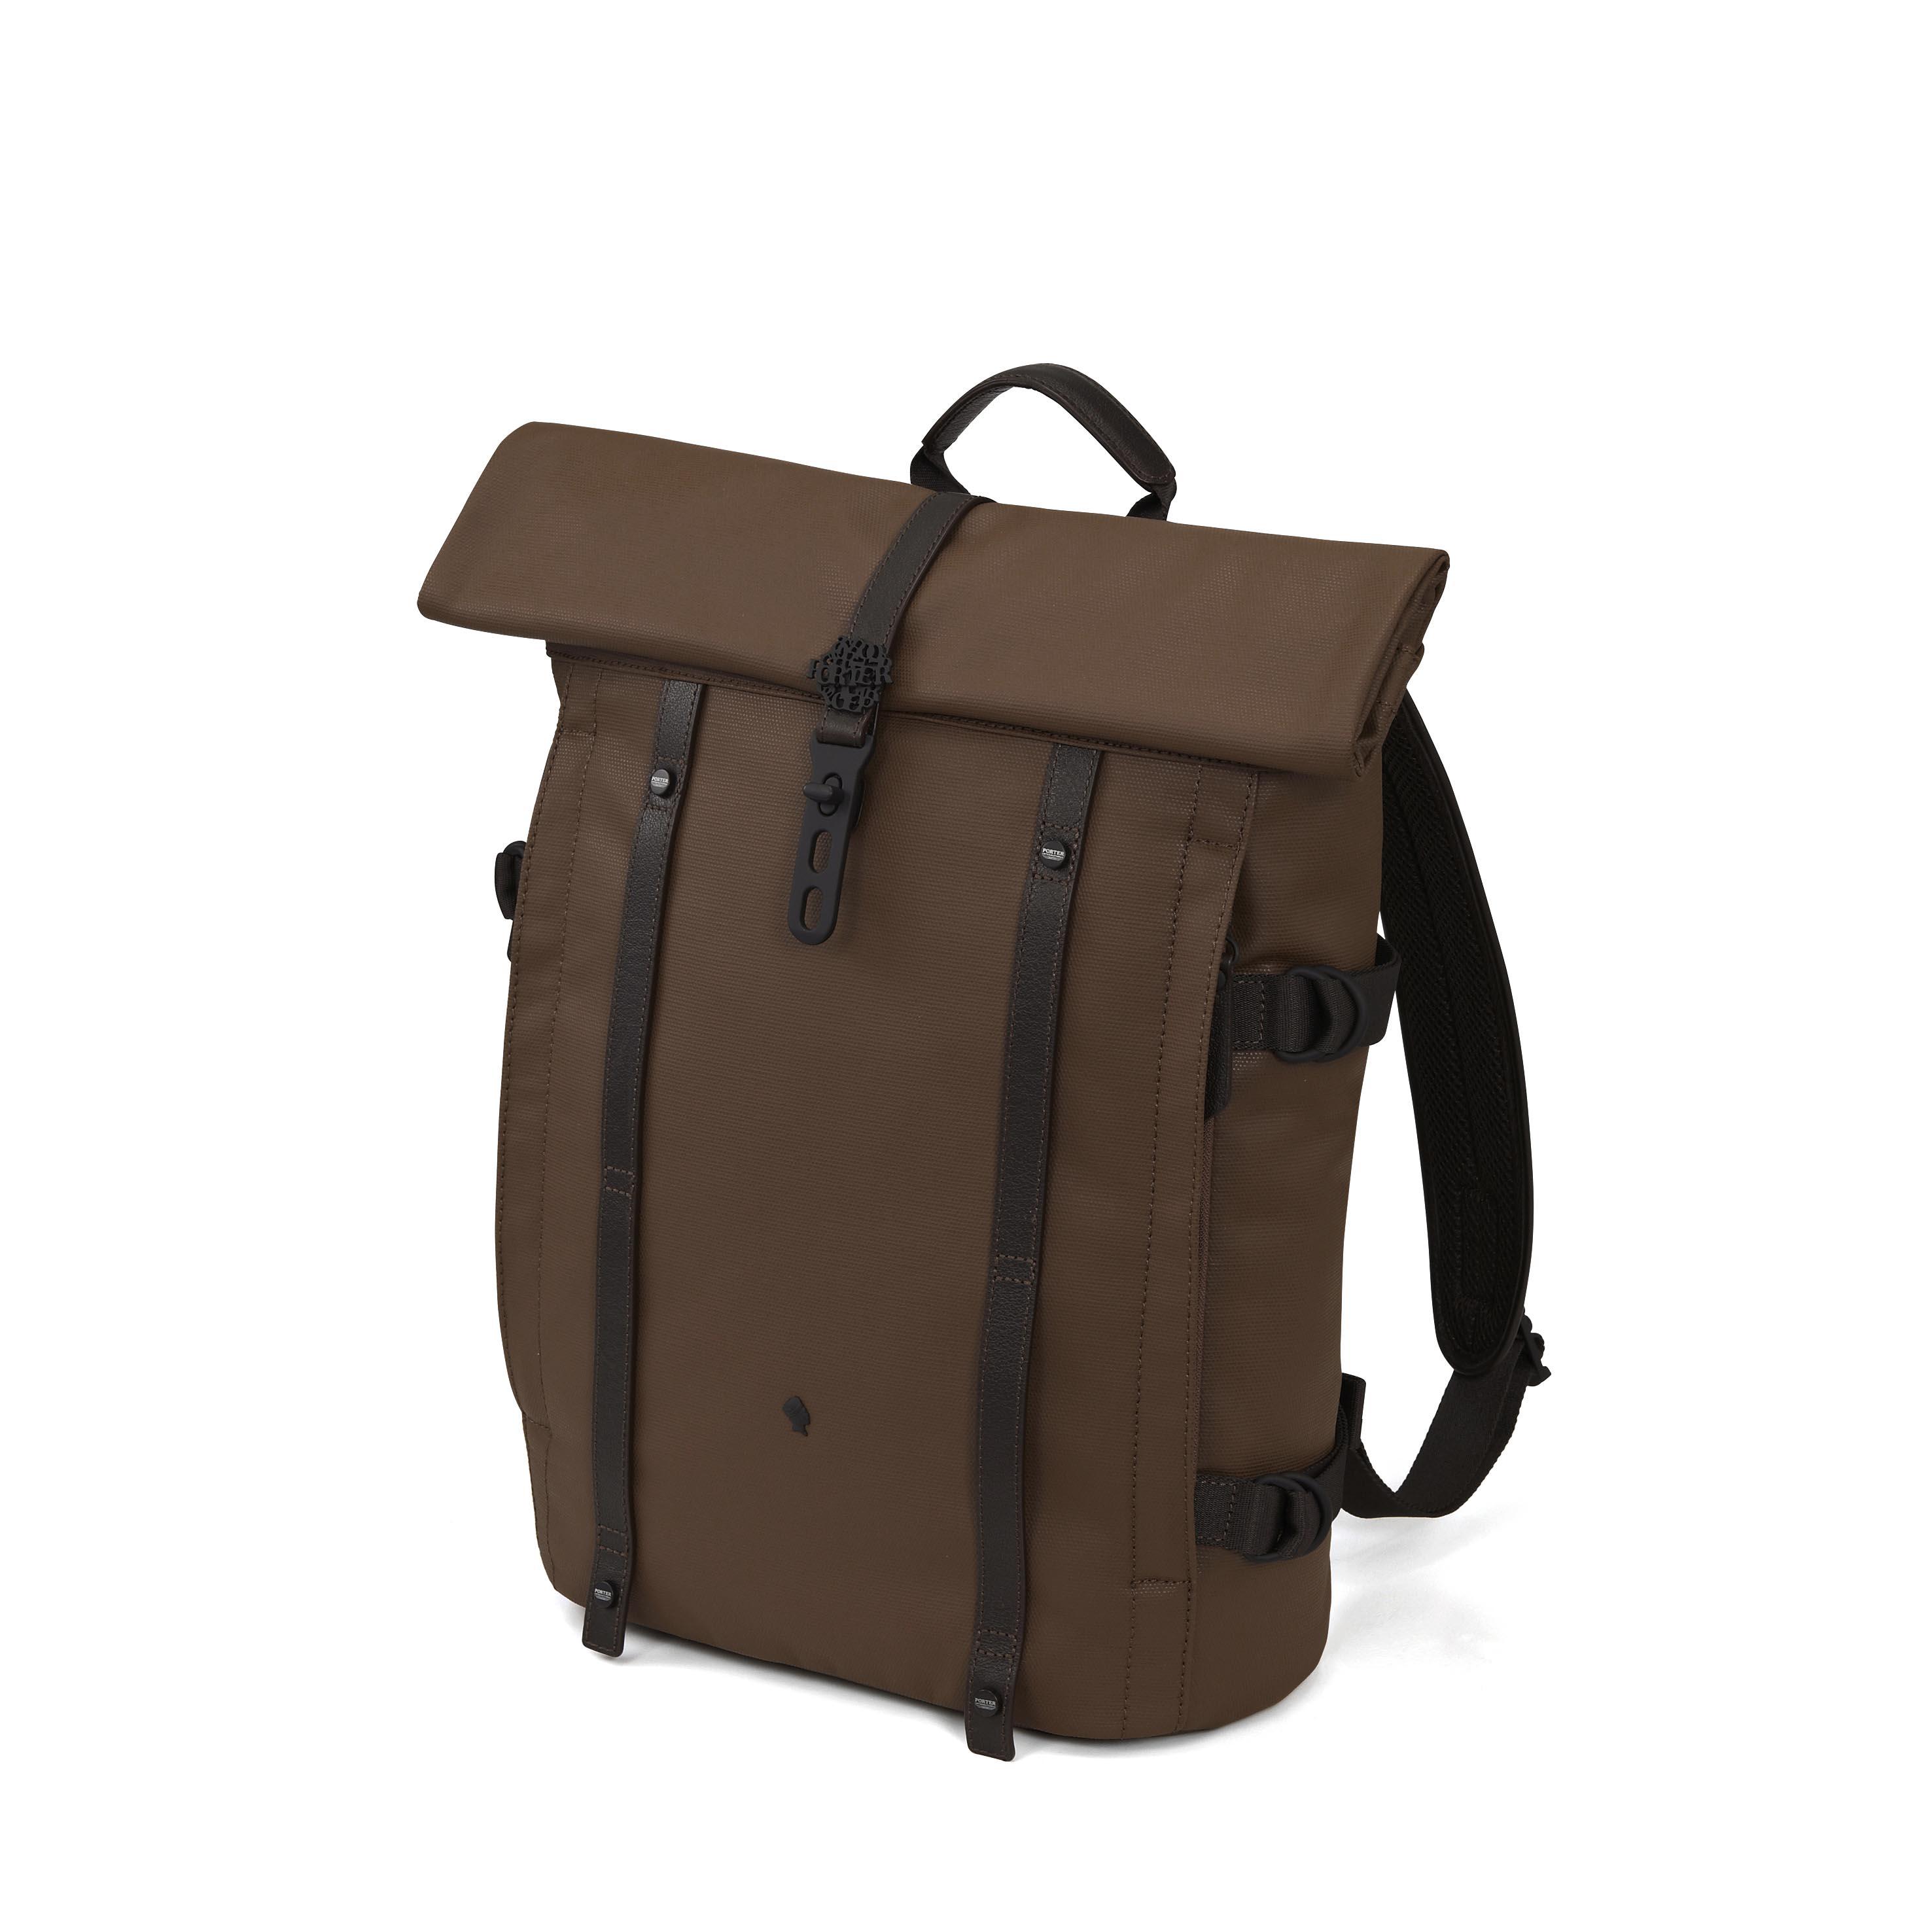 DUKE 栗褐色背包 NTD 10500 (側)